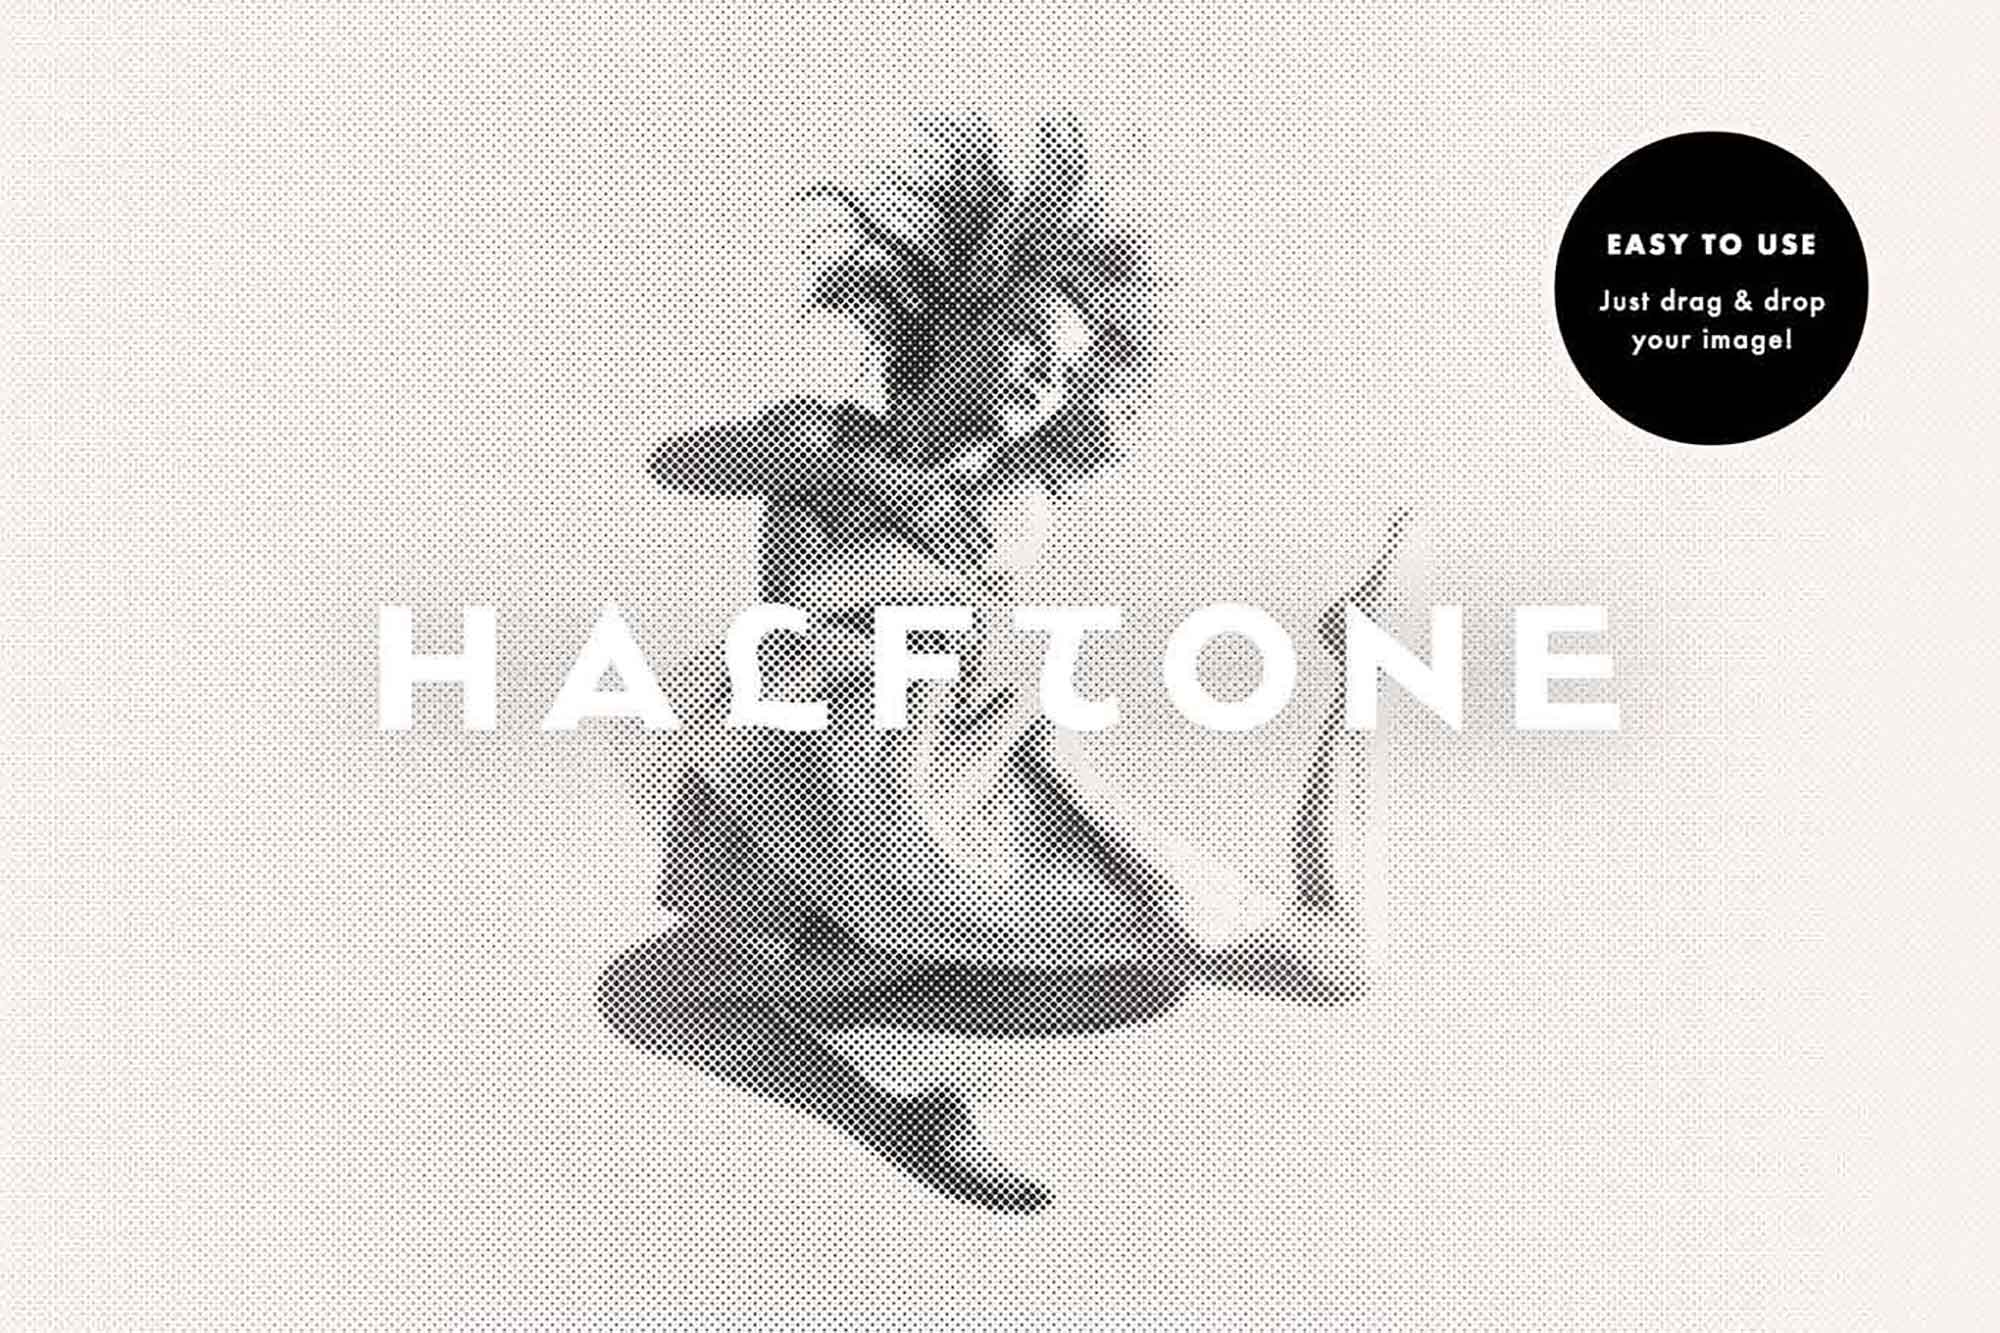 Halftone Photoshop Effect